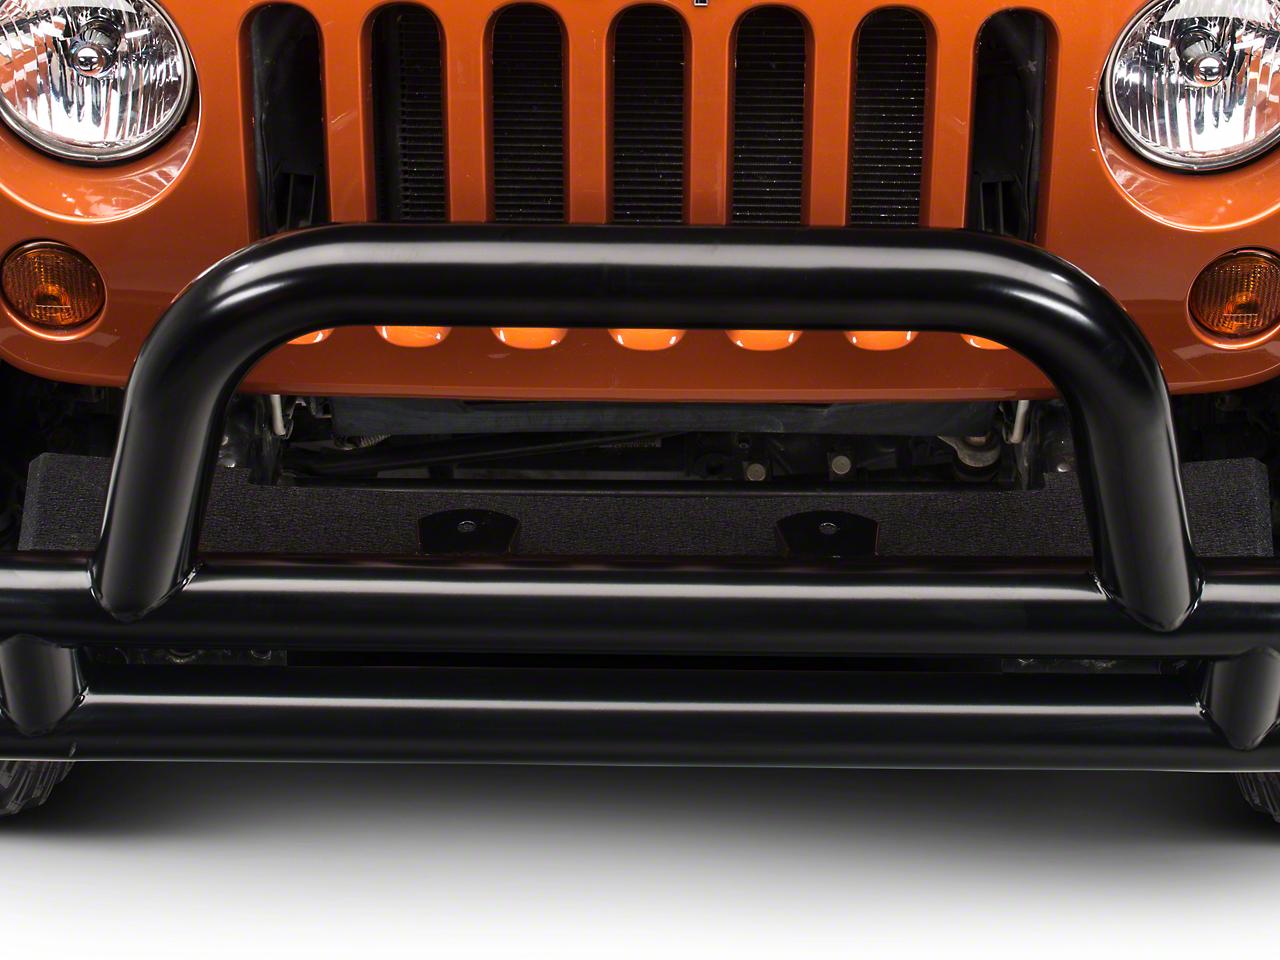 RedRock 4x4 Front Fill Plate - Textured Black (07-18 Jeep Wrangler JK)